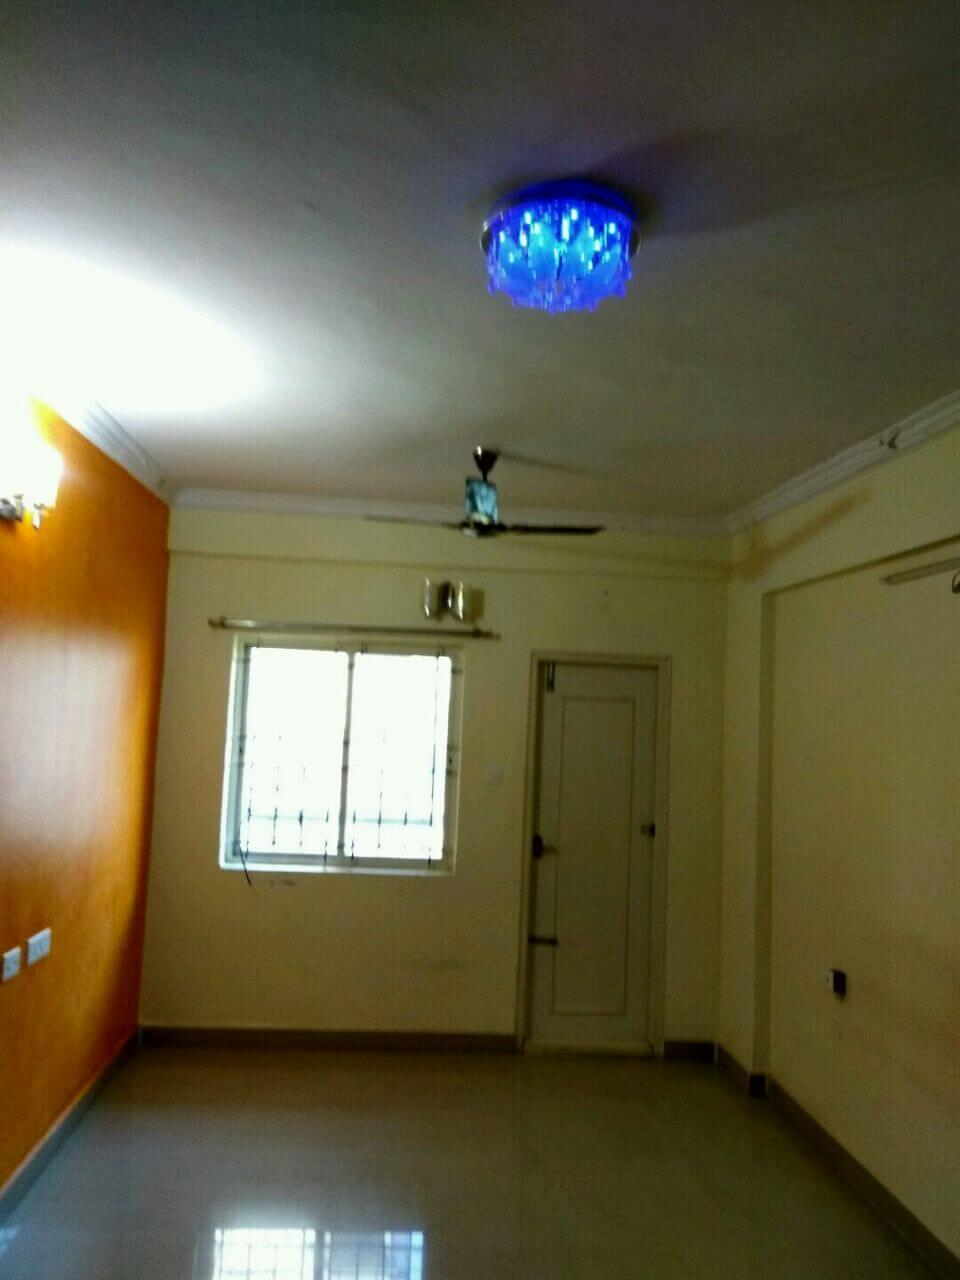 For Rent, 3 BHK, Semi- Furnished, Mahaveer Varna appts., Kadugodi, Bangalore